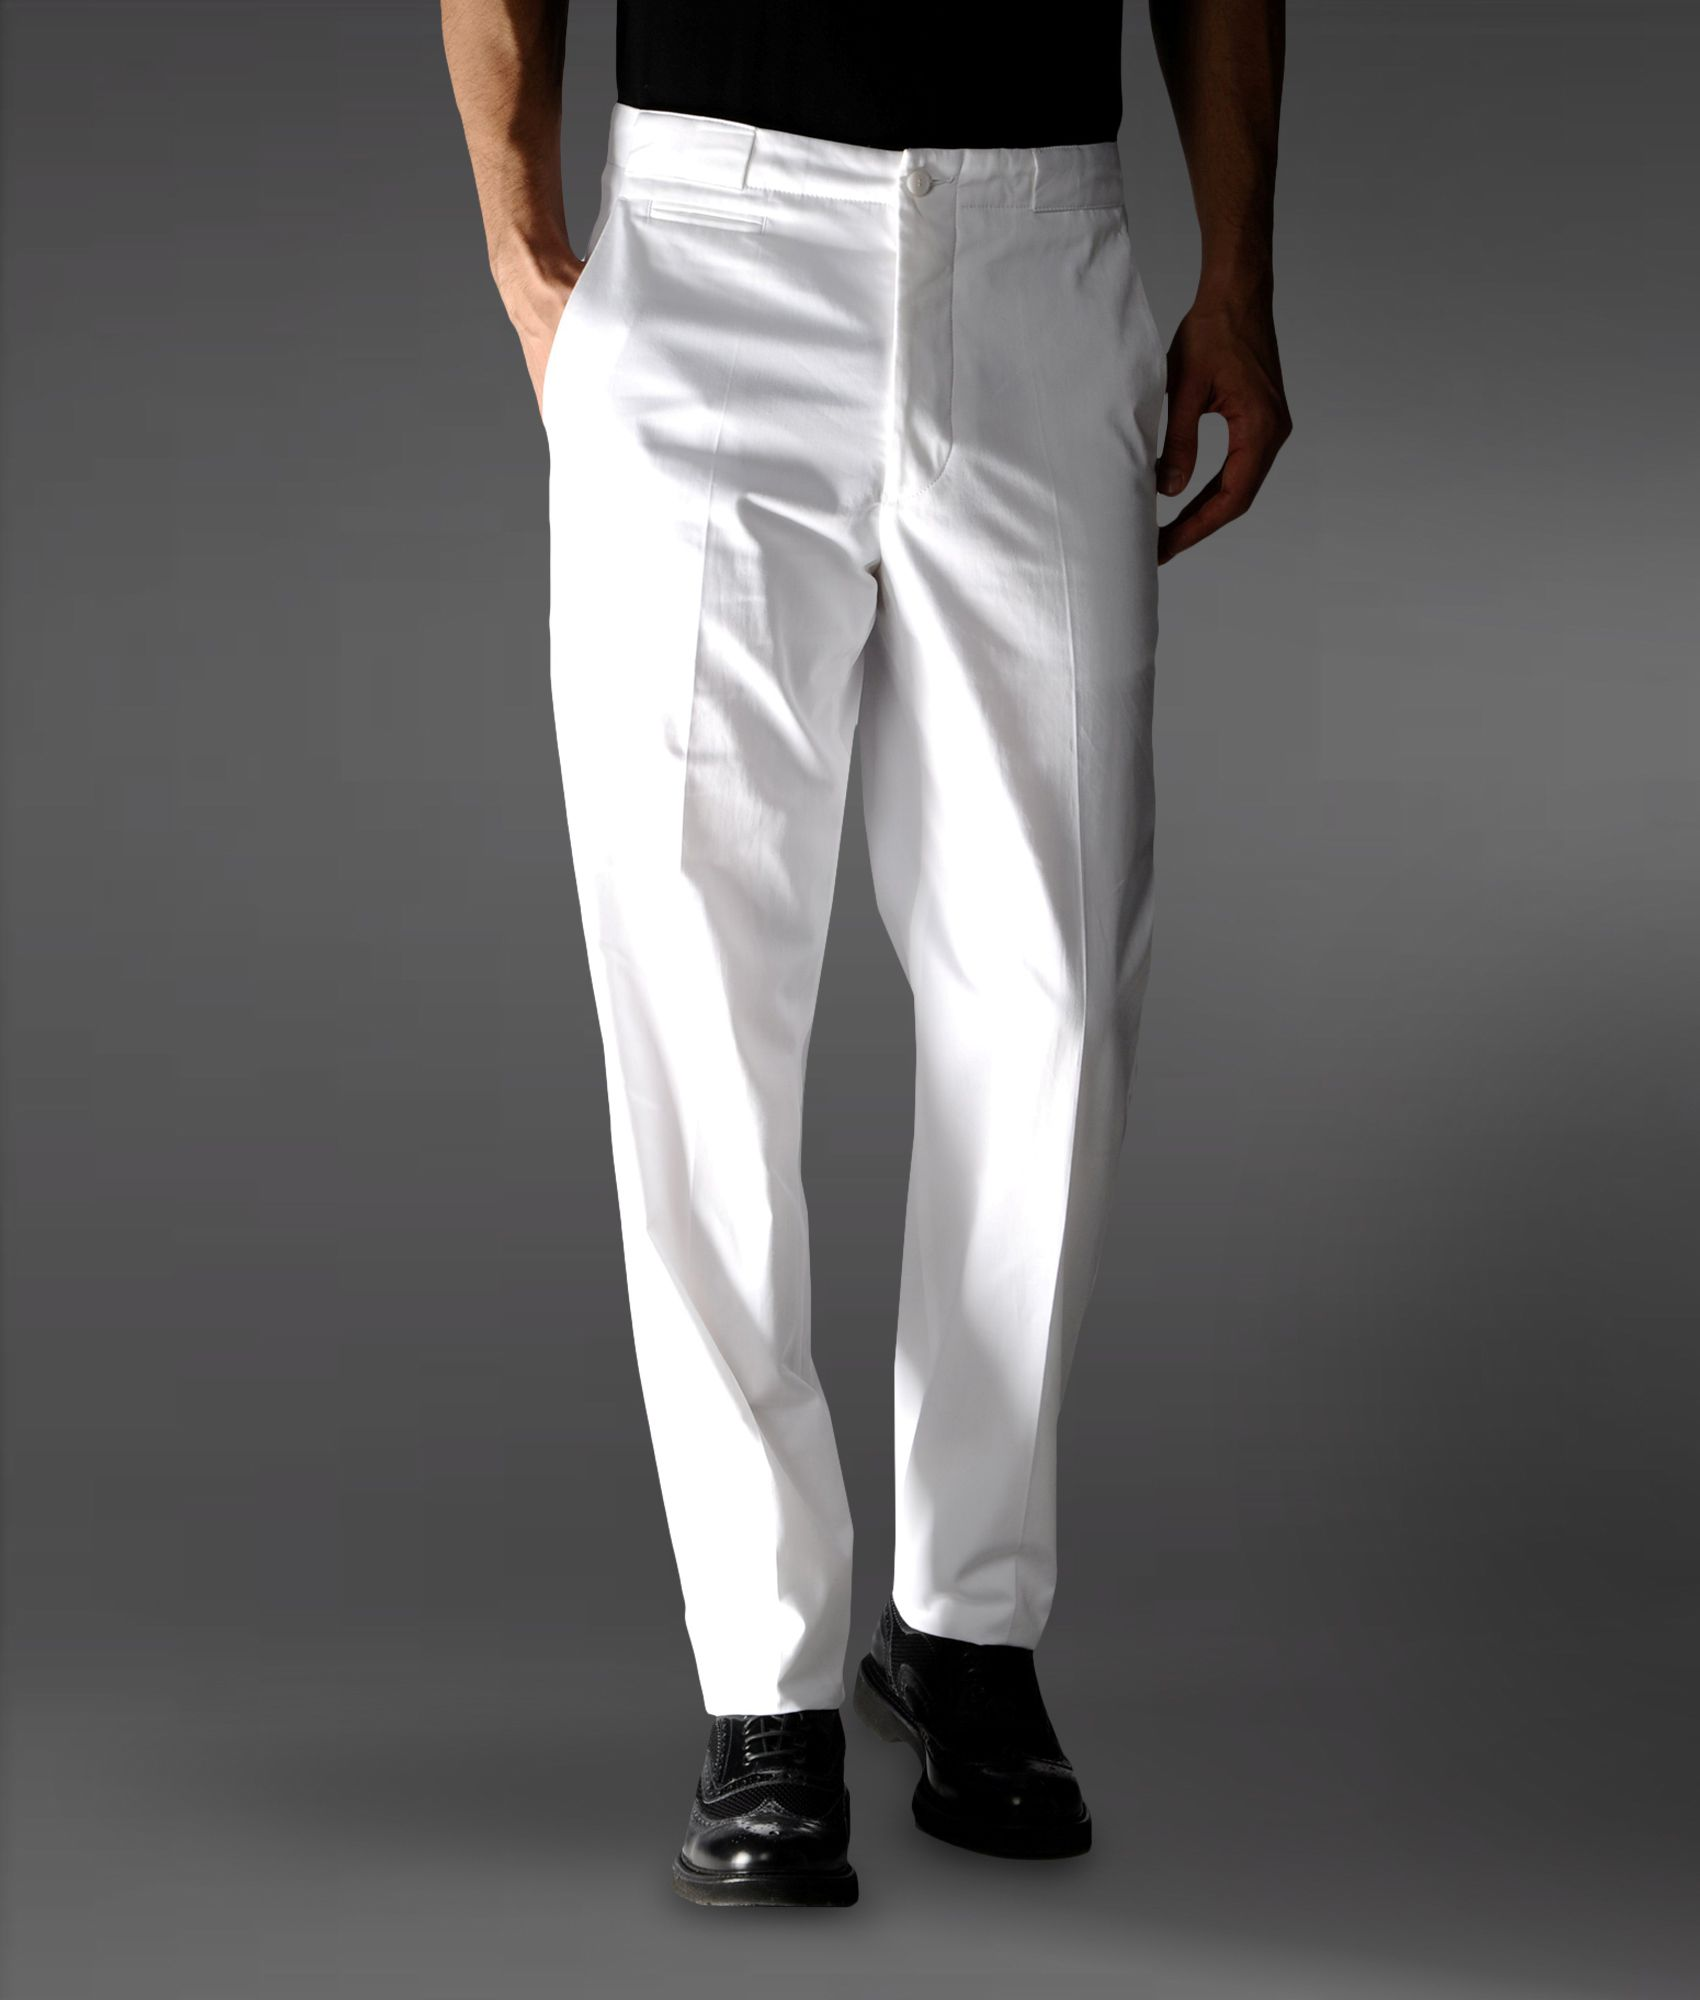 Khaki Mens Jeans